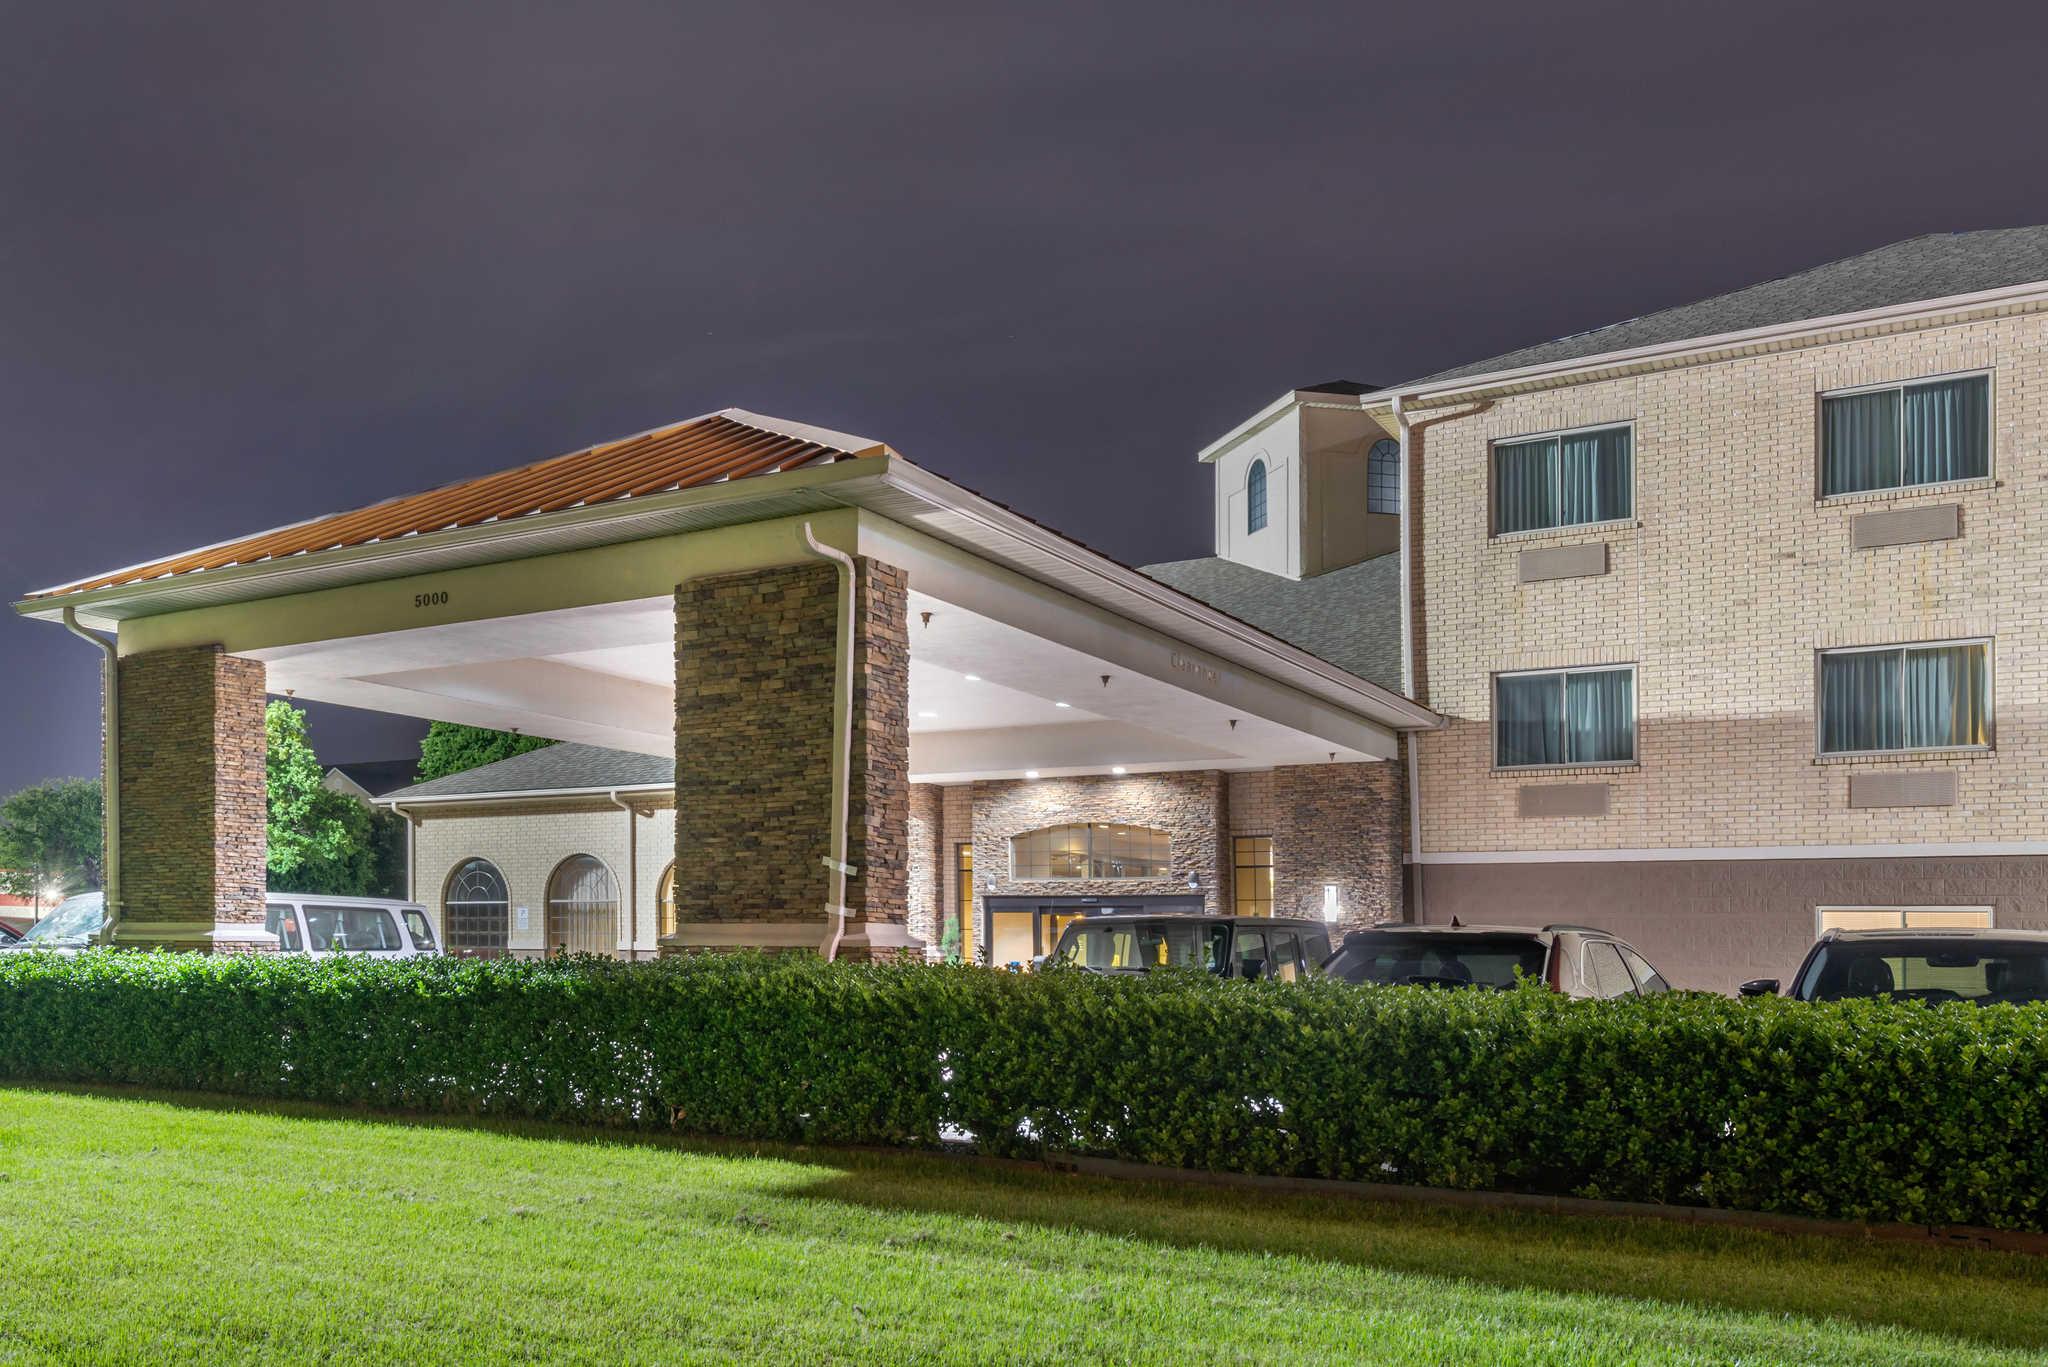 Comfort Inn DFW Airport North image 4